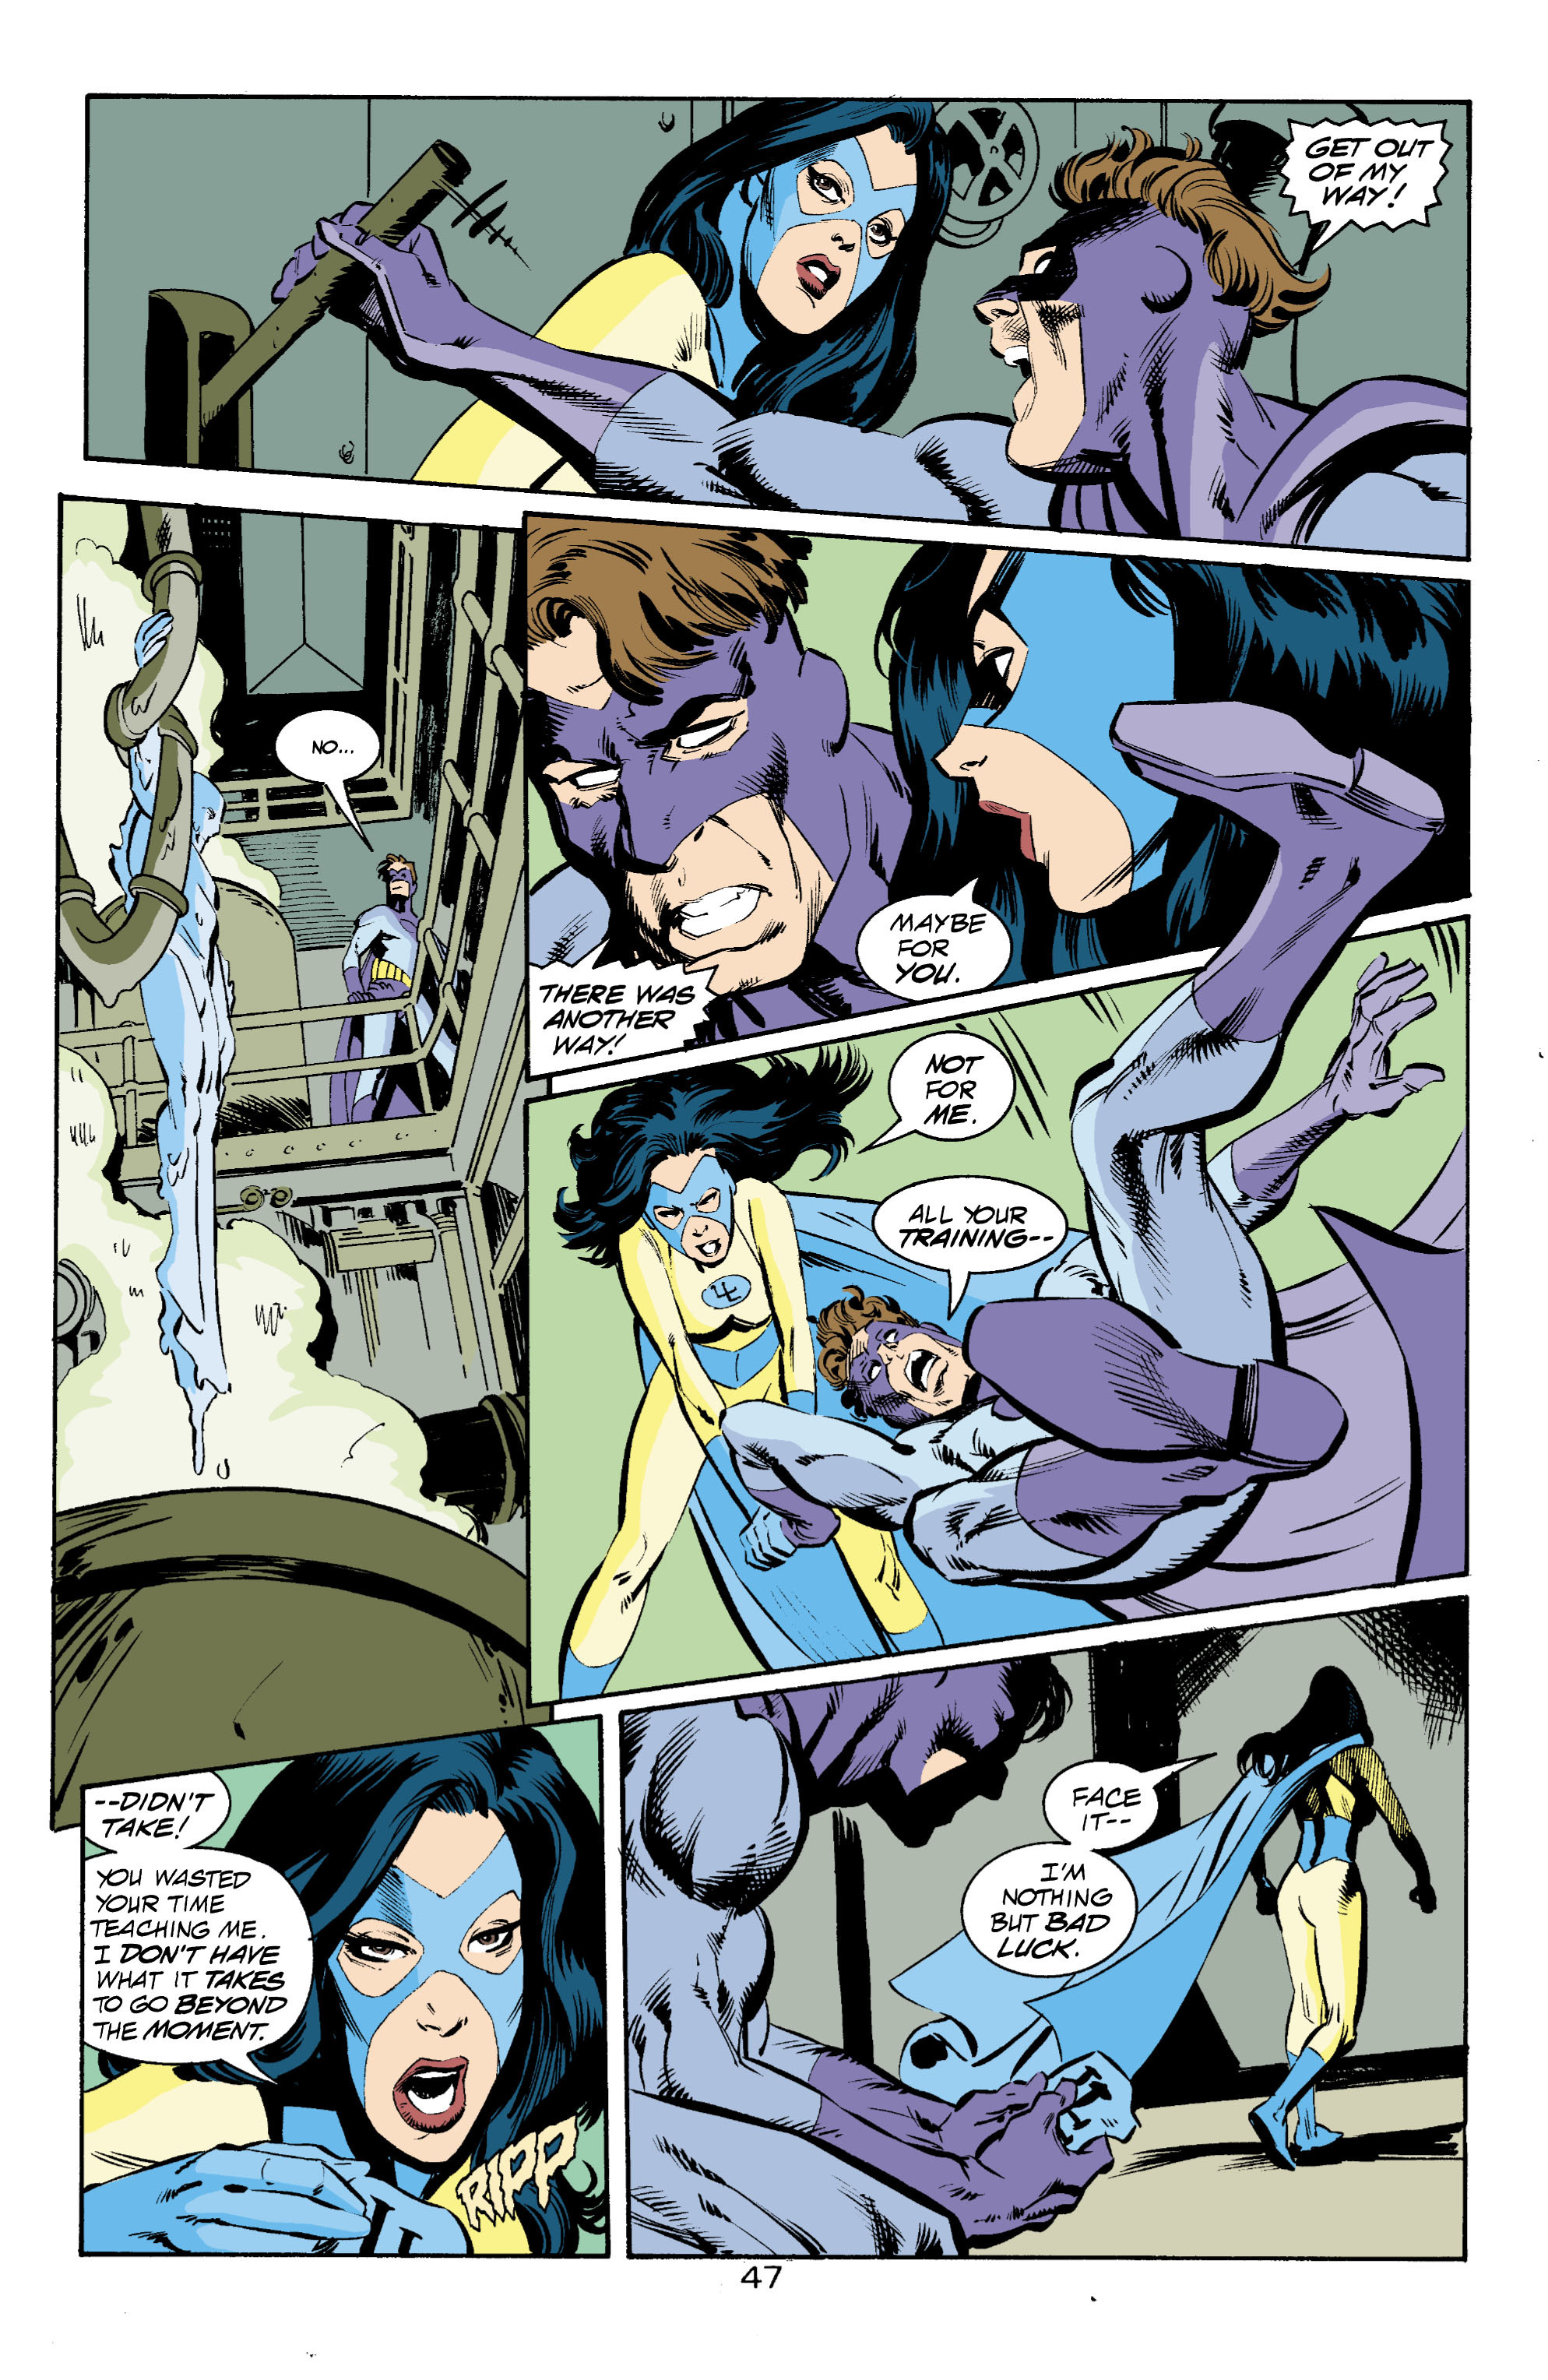 Detective Comics (1937) 750 Page 47